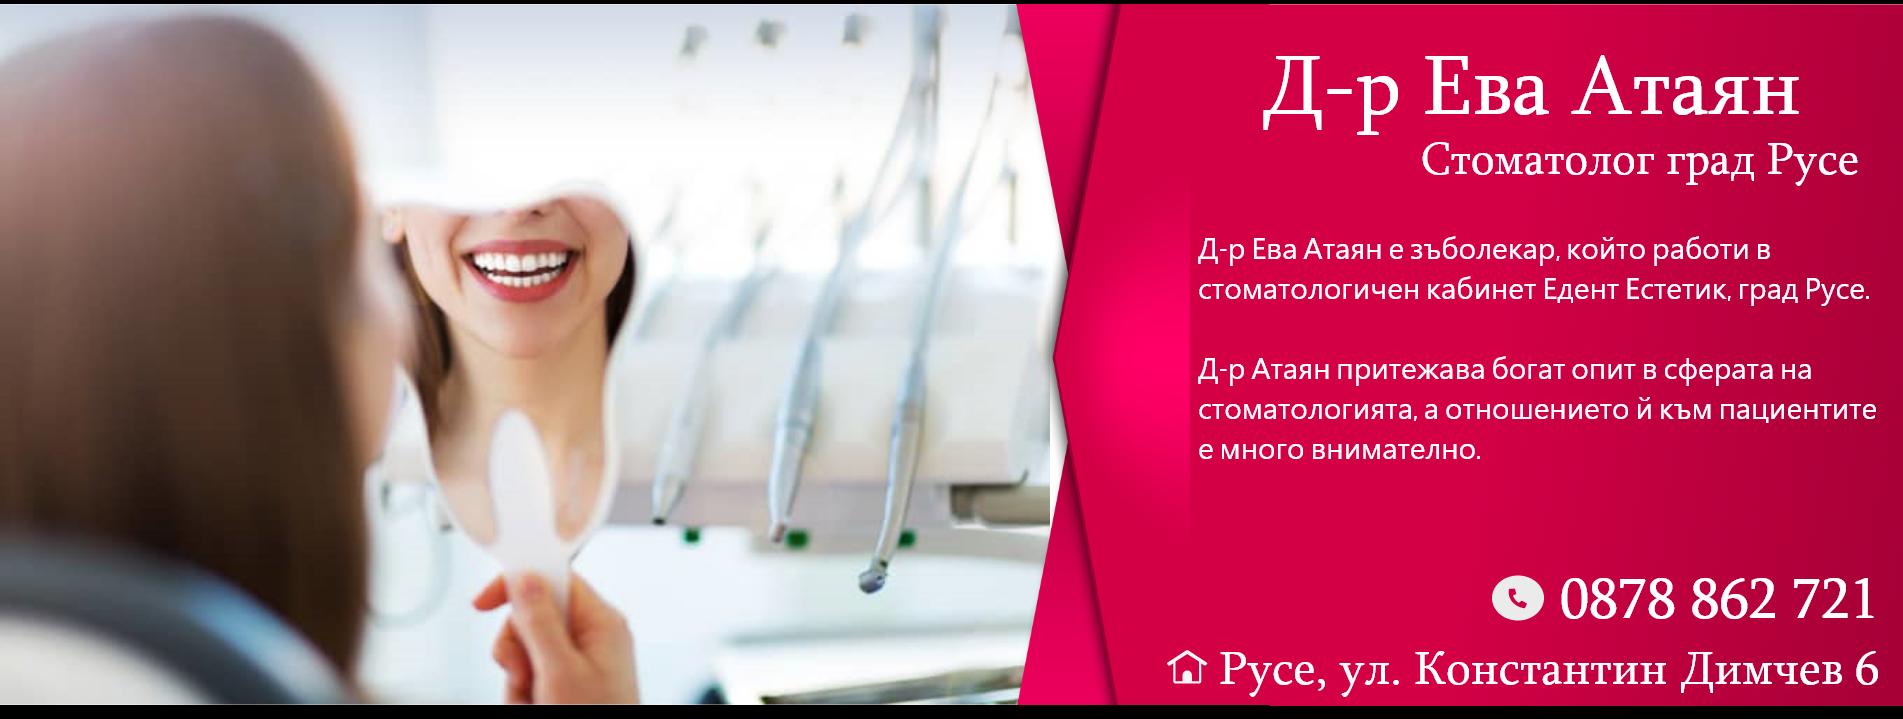 Ева Атаян - стоматолог Русе